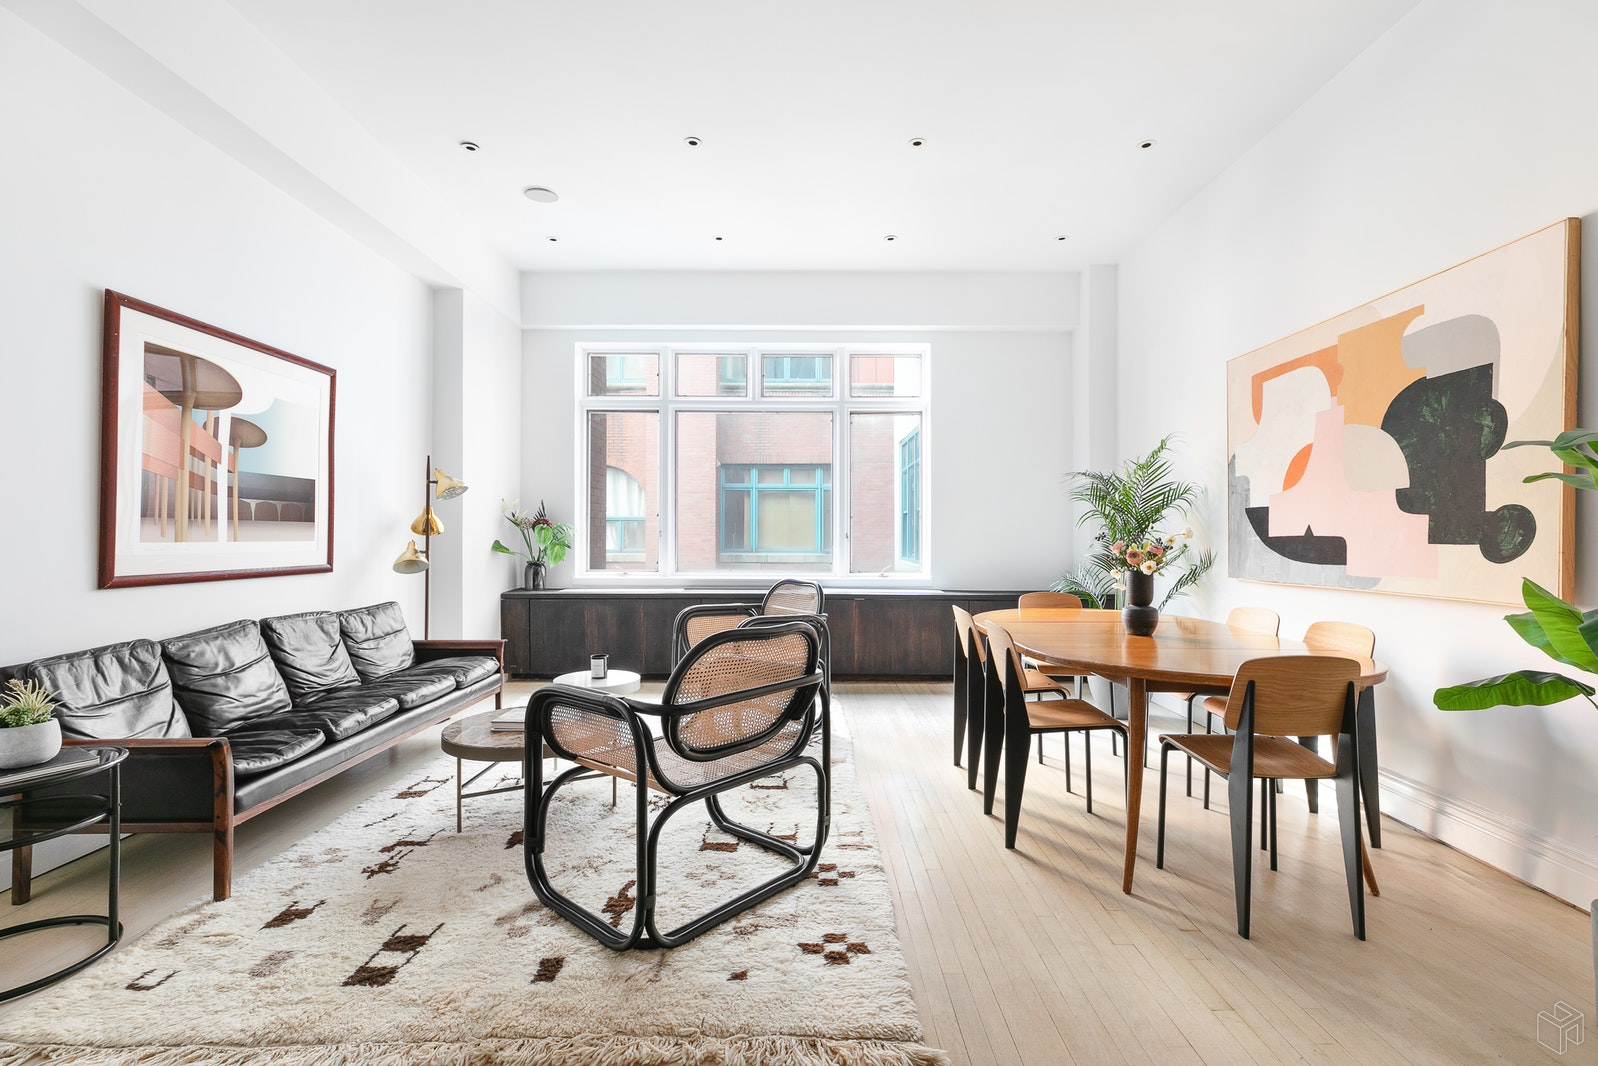 125 EAST 12TH STREET 4D, East Village, $1,450,000, Web #: 19501502